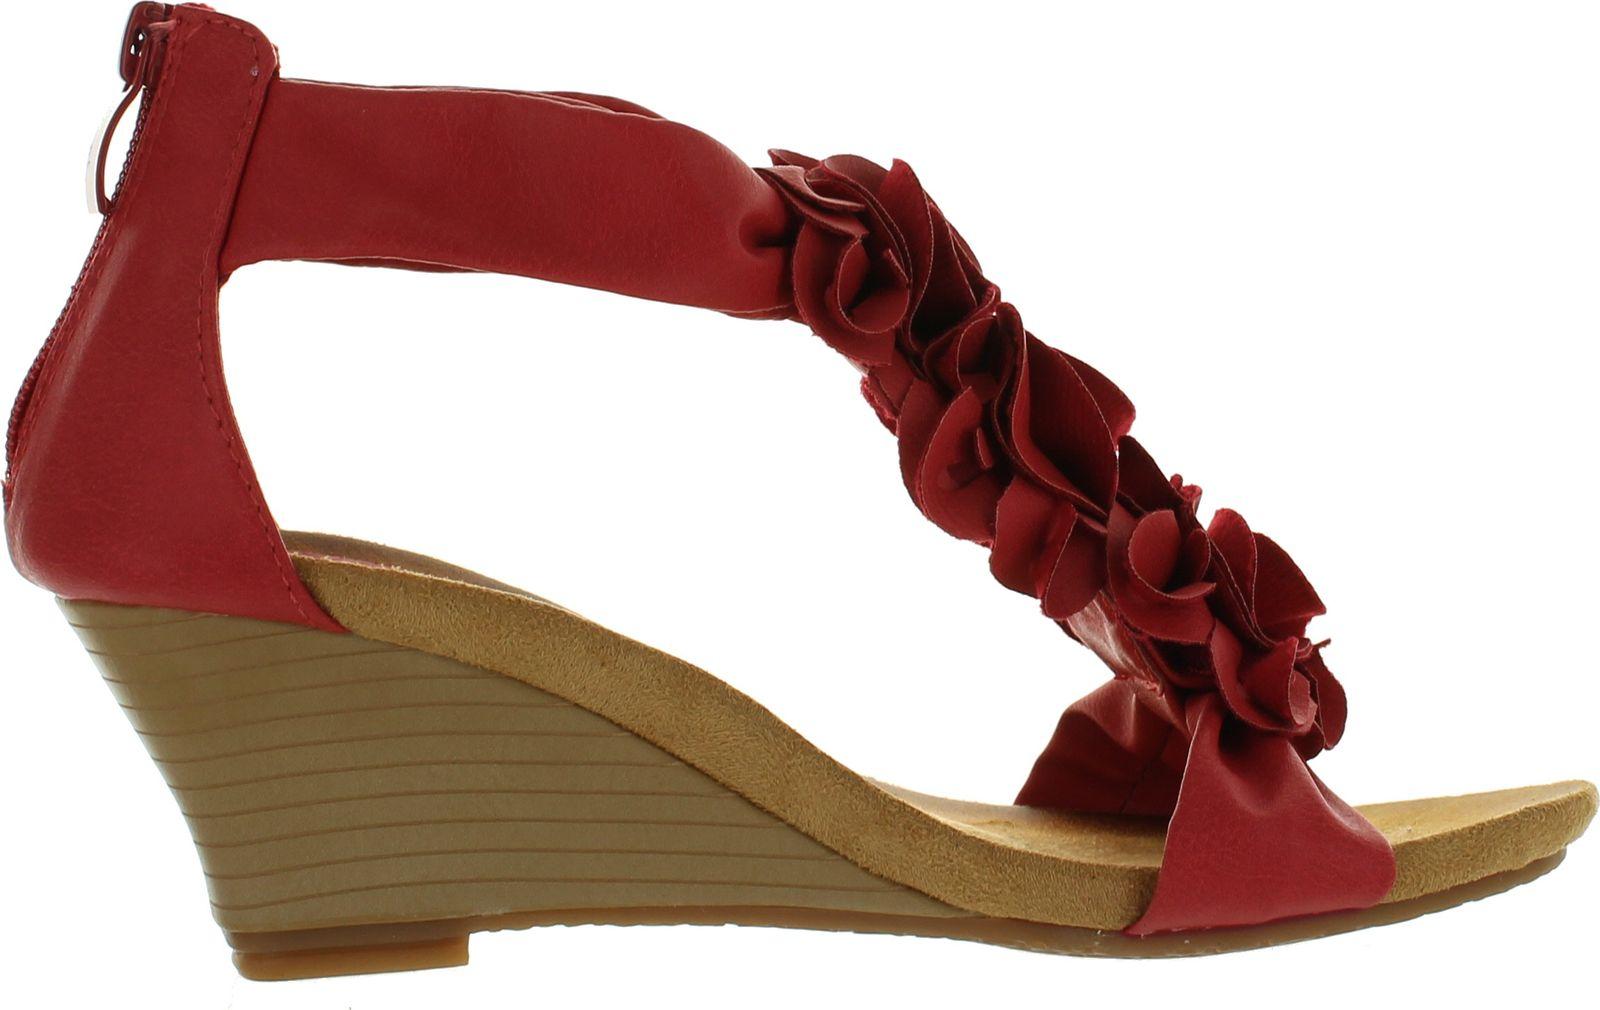 thumbnail 14 - PATRIZIA by Spring Step Womens Harlequin Fashion Wedge Sandals